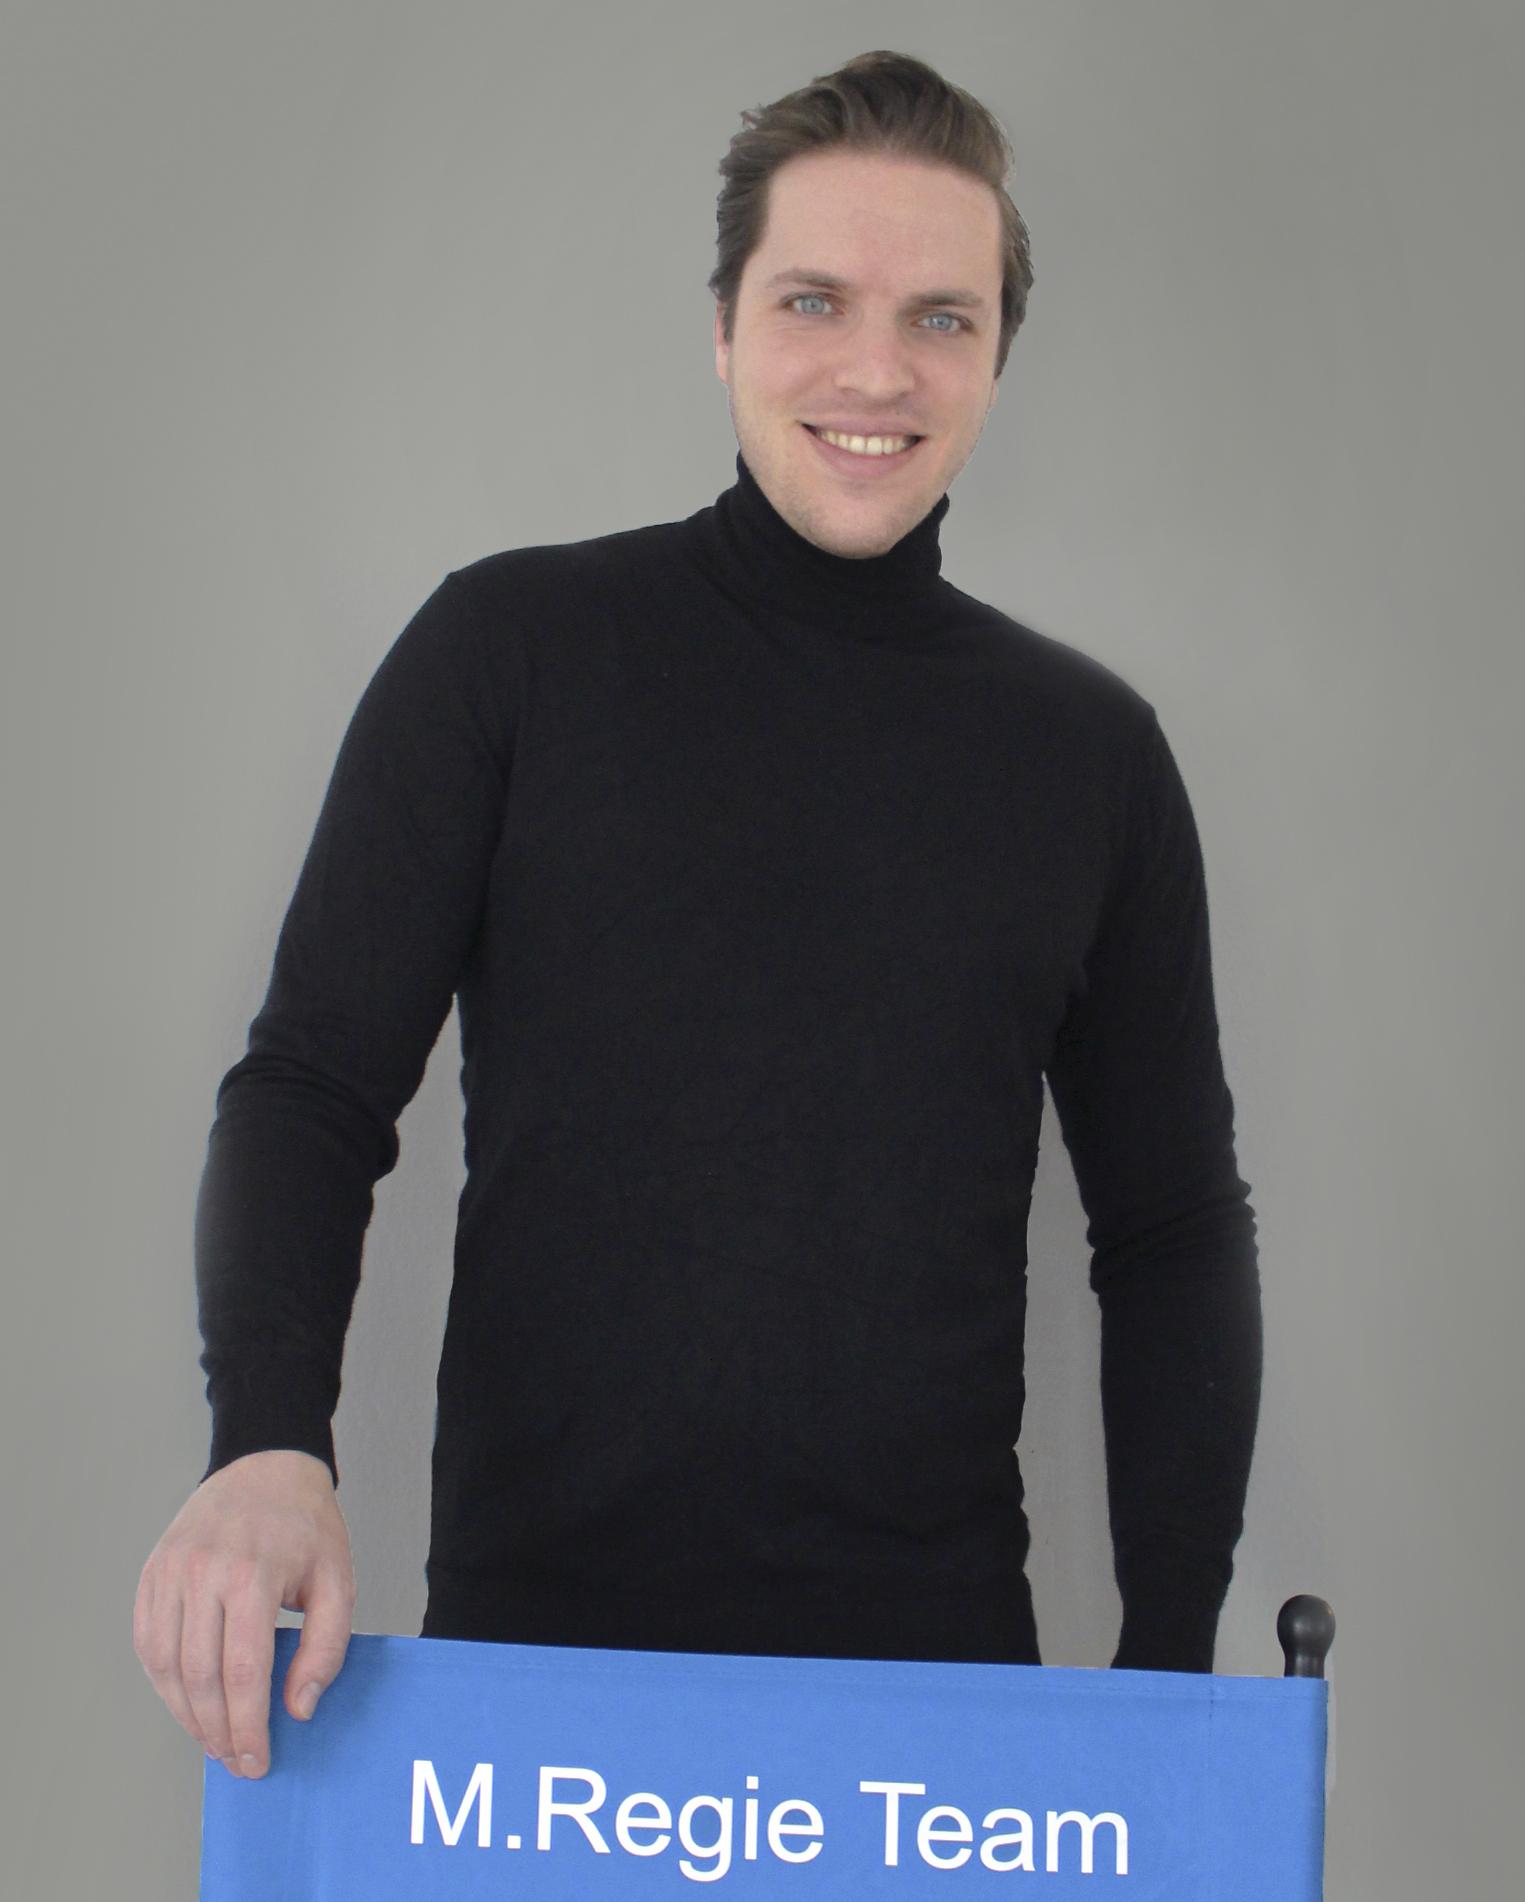 Alexander Maahs